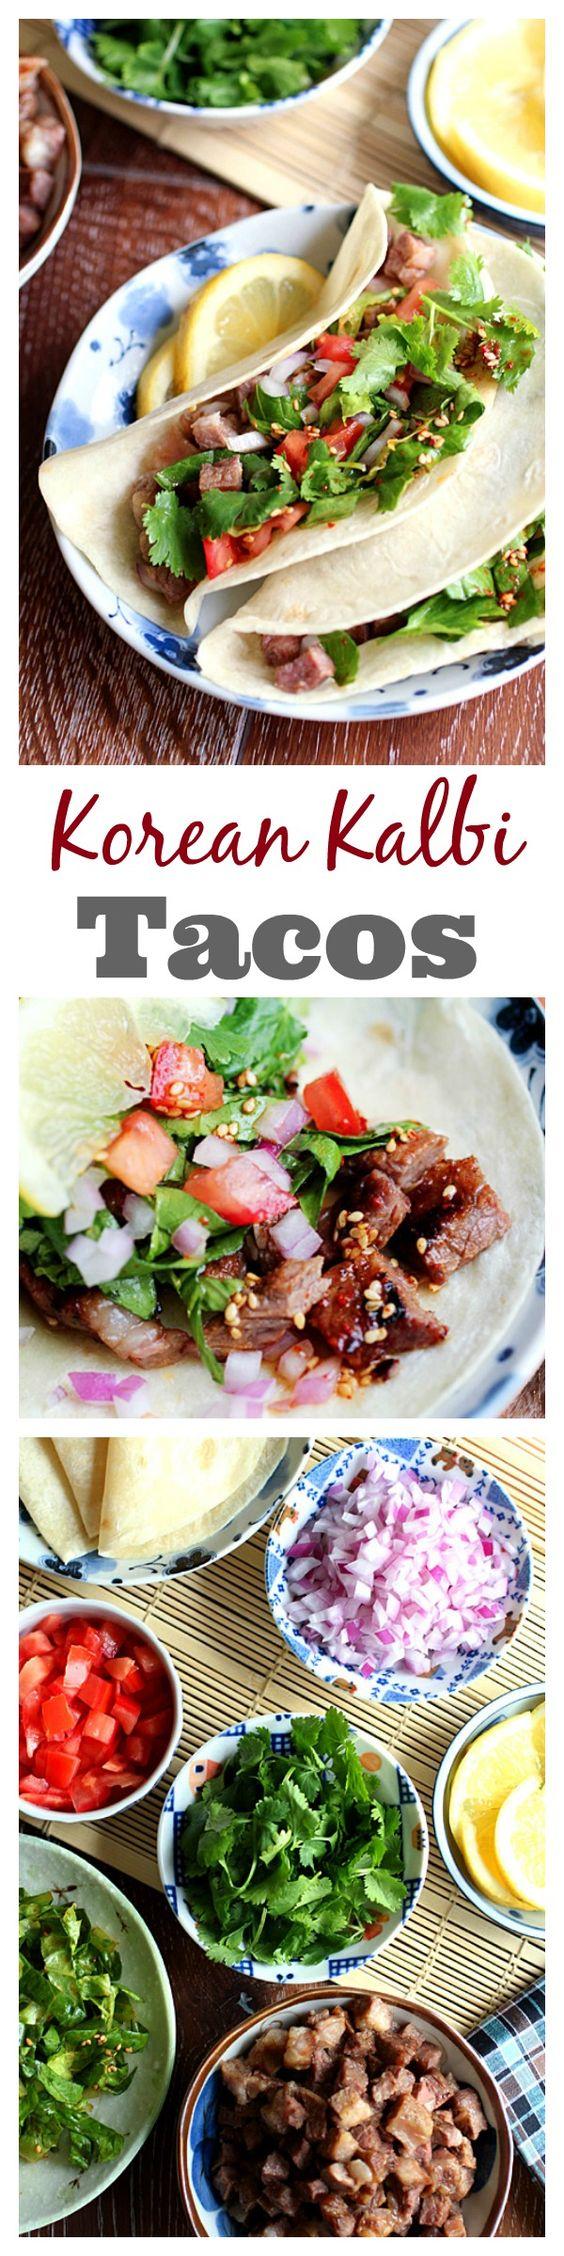 beef short ribs short ribs ribs tacos beef shorts korean tacos